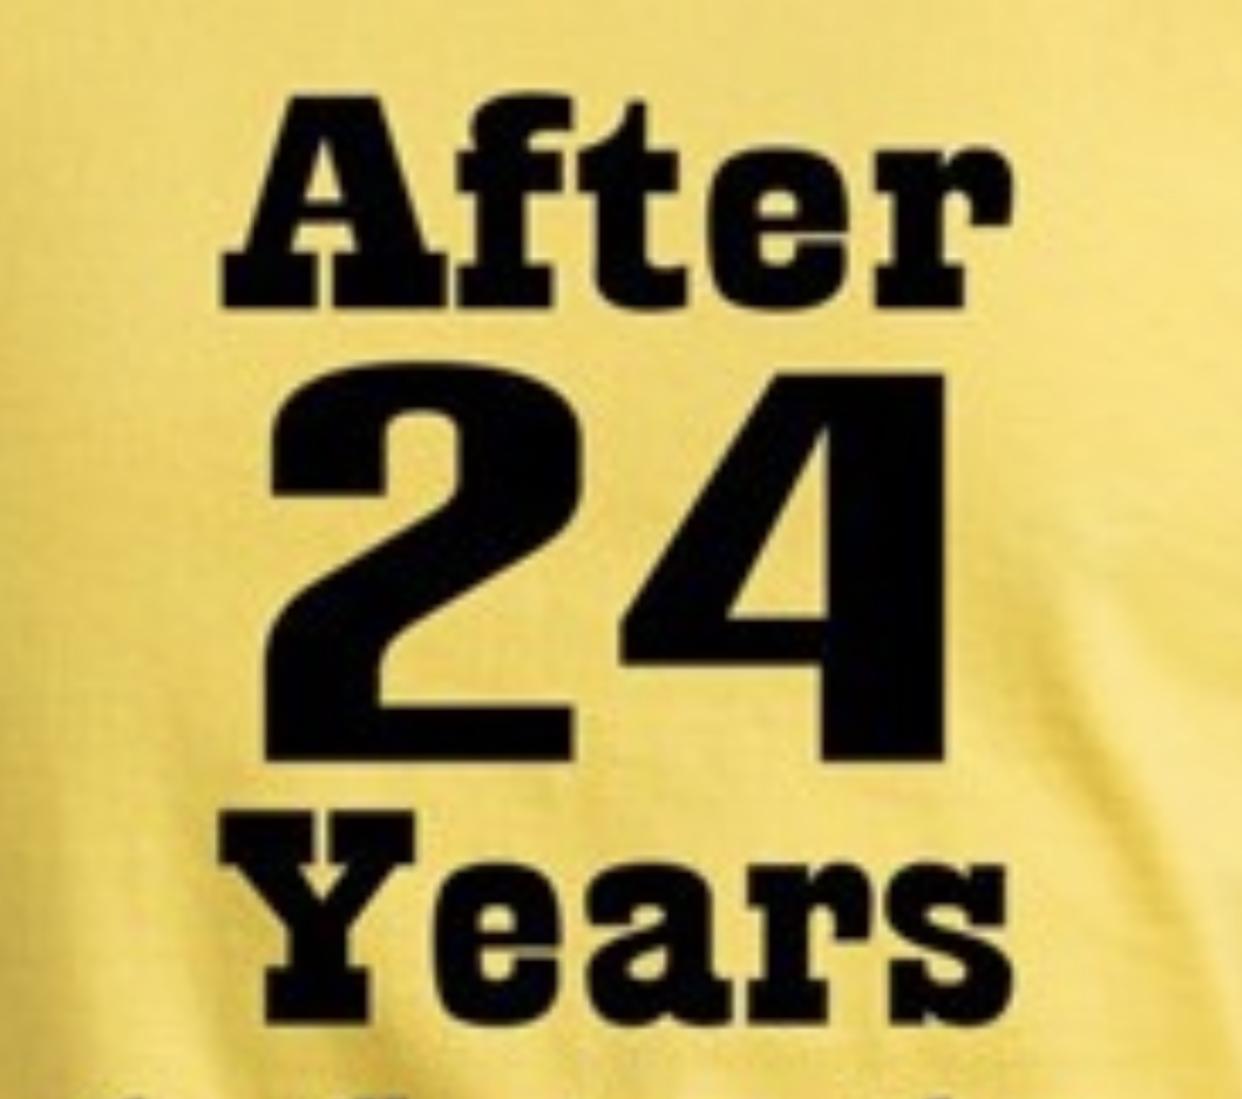 That's Nice Celebrates 24 Years